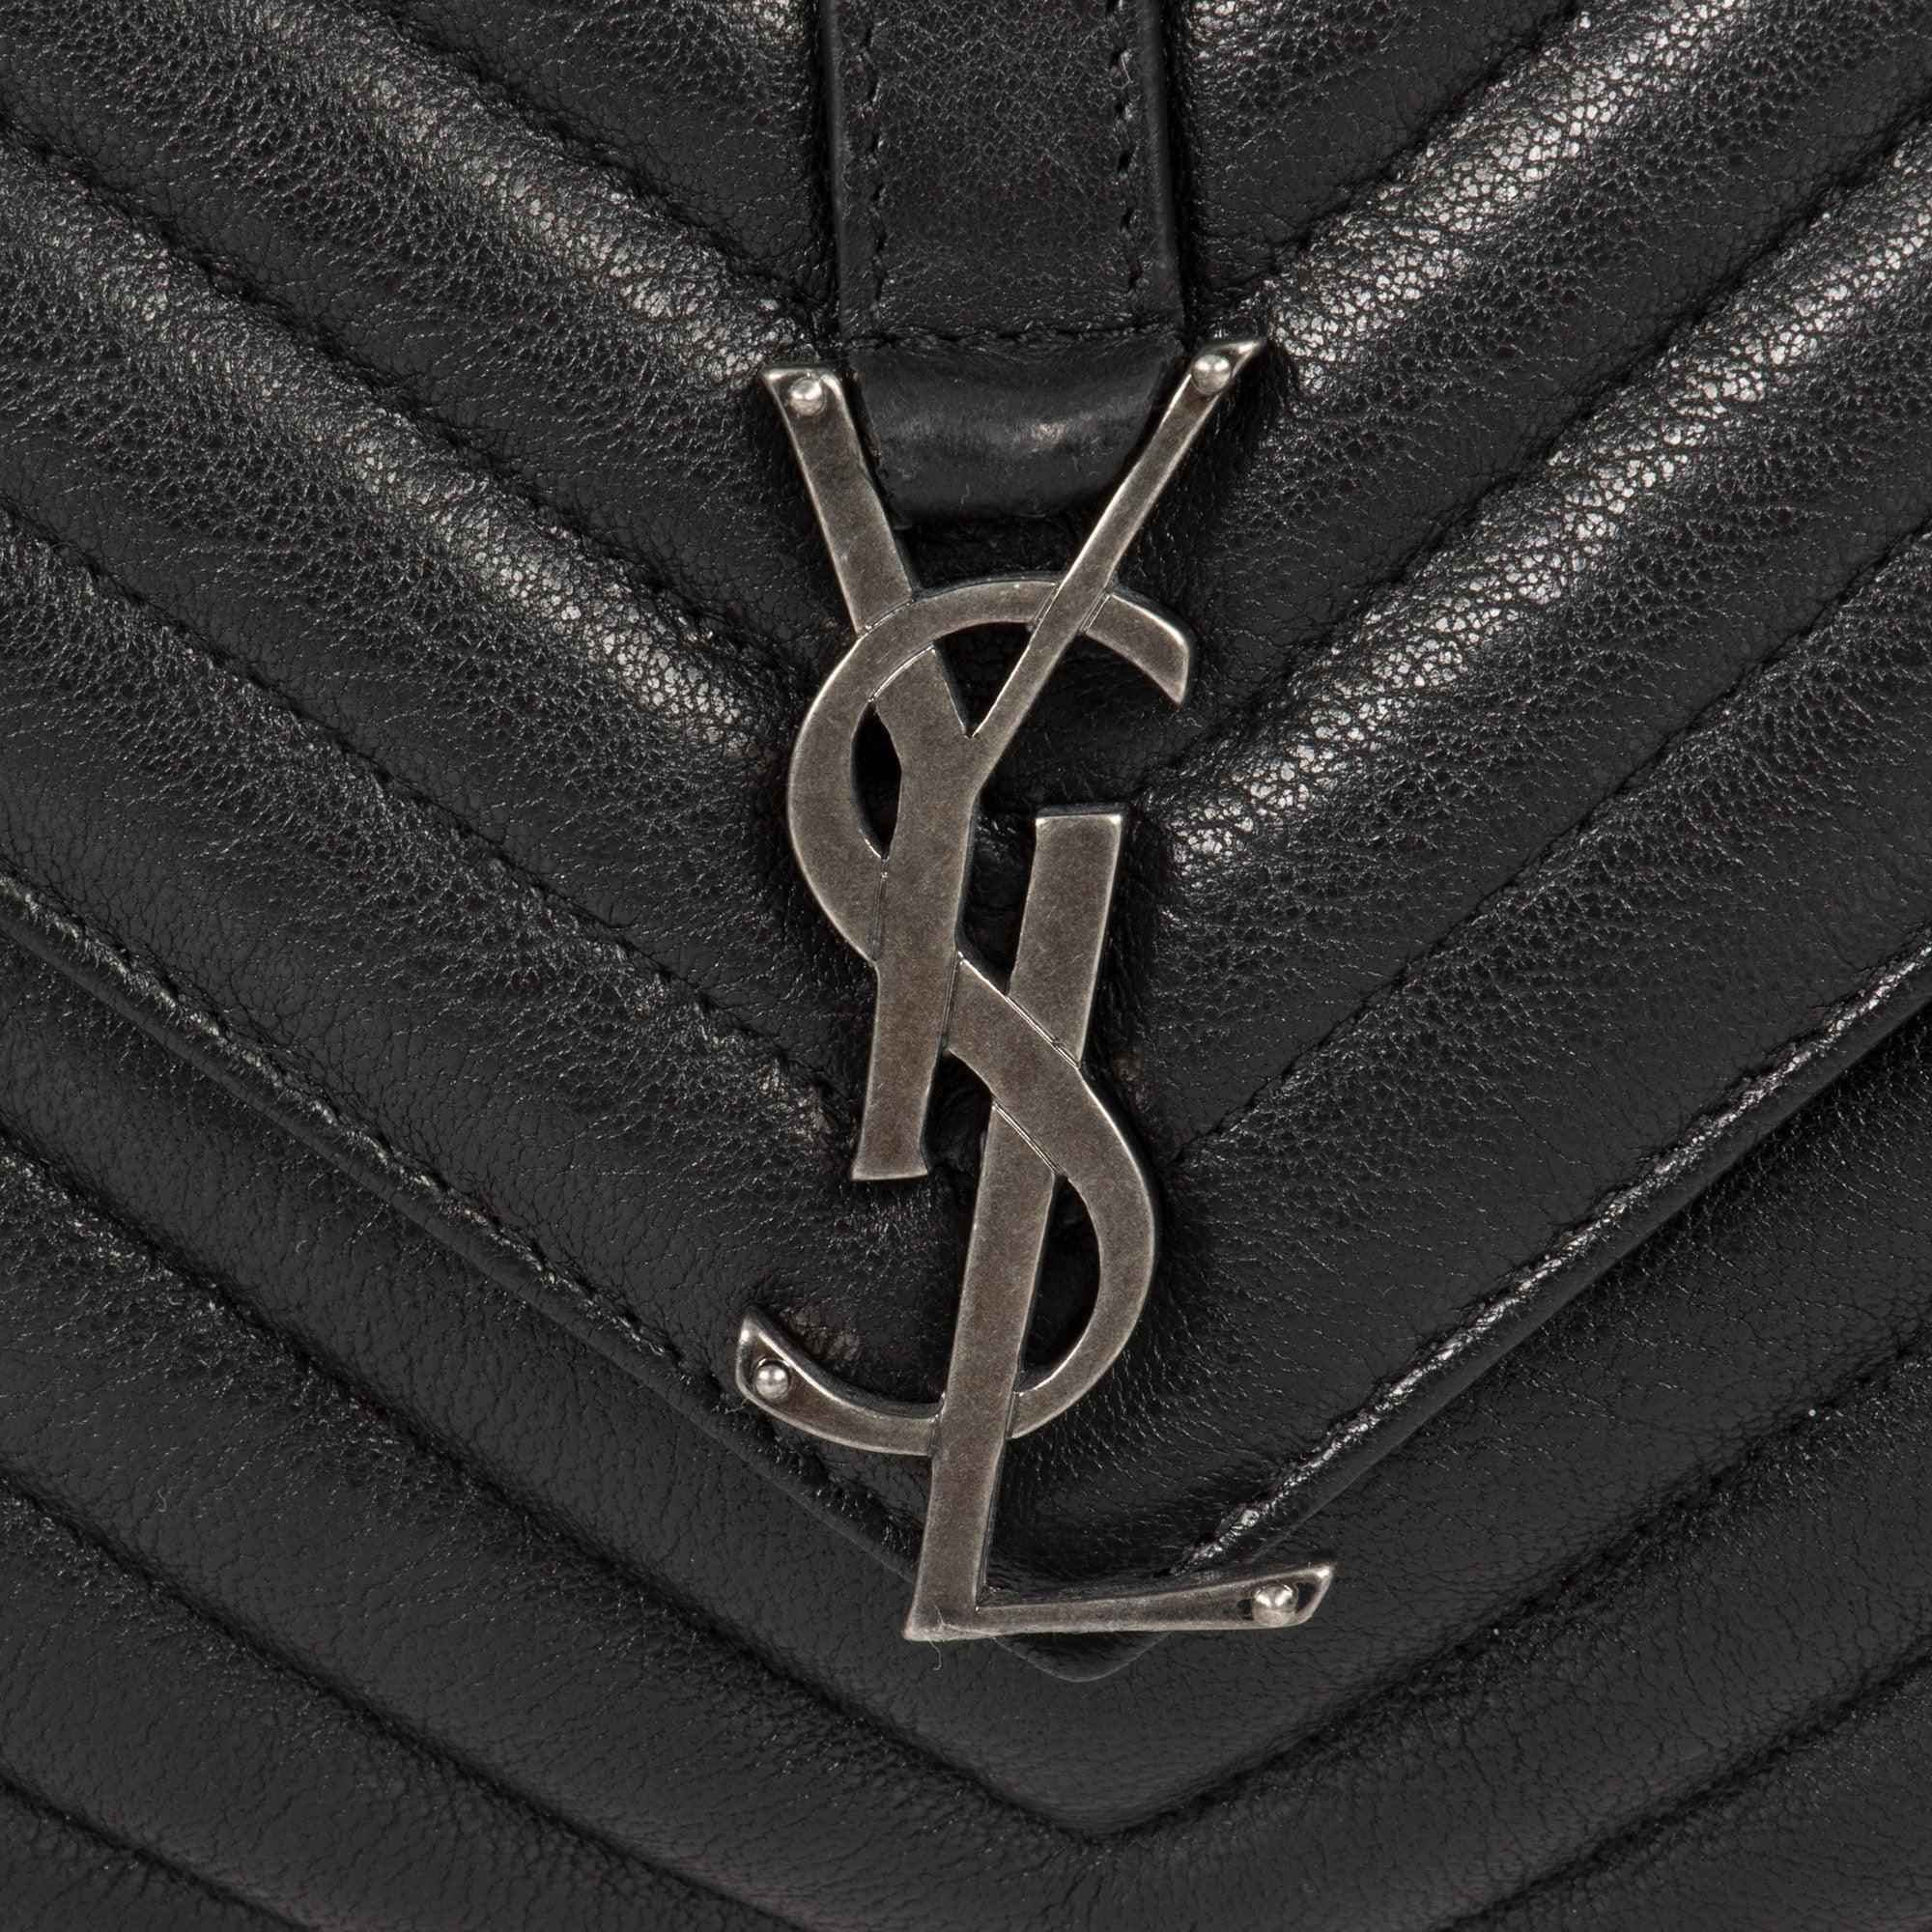 4c1453fb50d Shop Saint Laurent Classic Medium Monogram Black Matelasse Leather College  Bag - Free Shipping Today - Overstock - 23076884